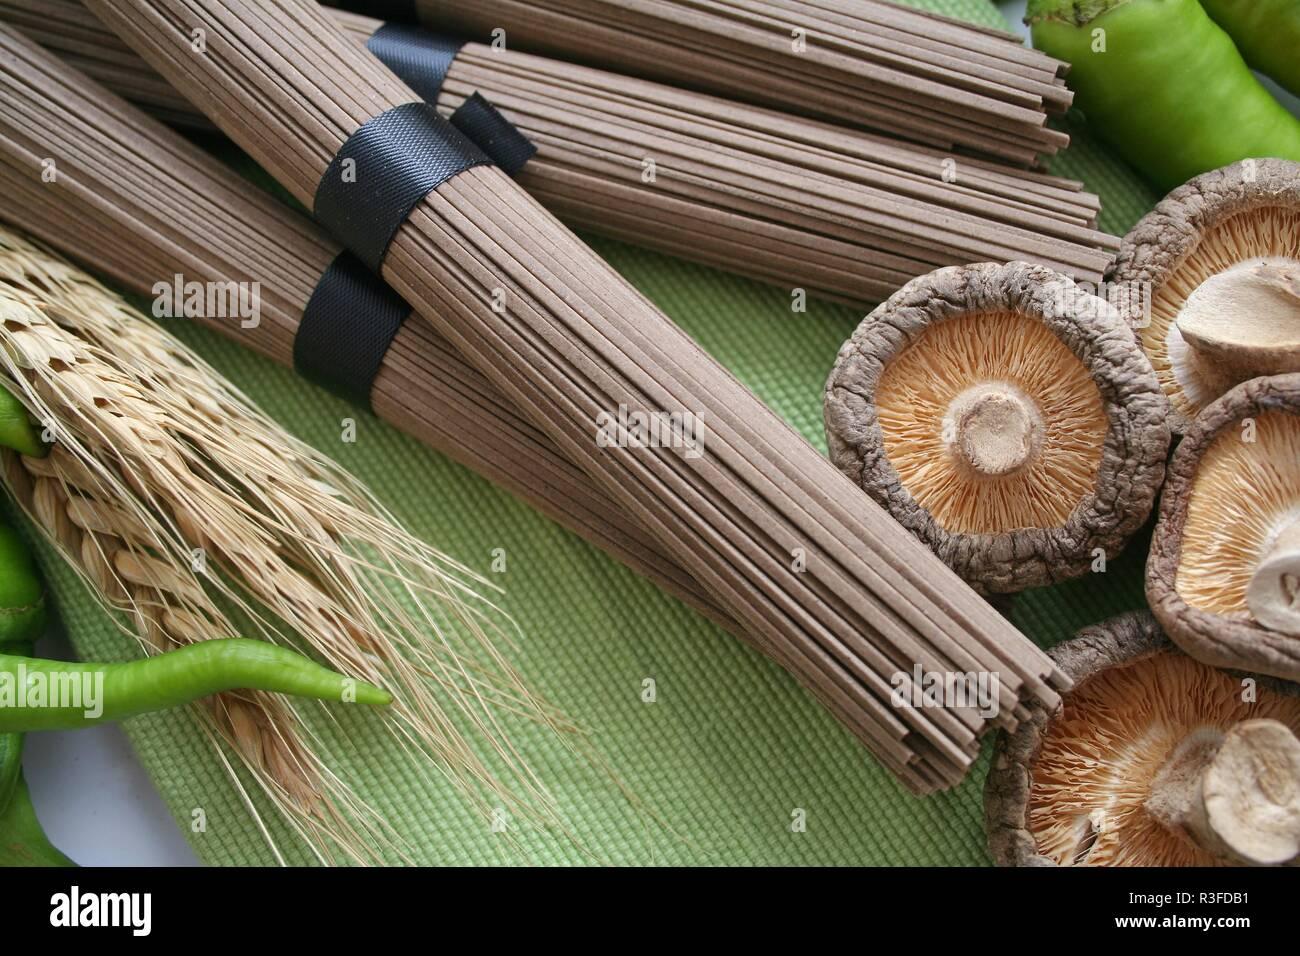 noodles soba - Stock Image